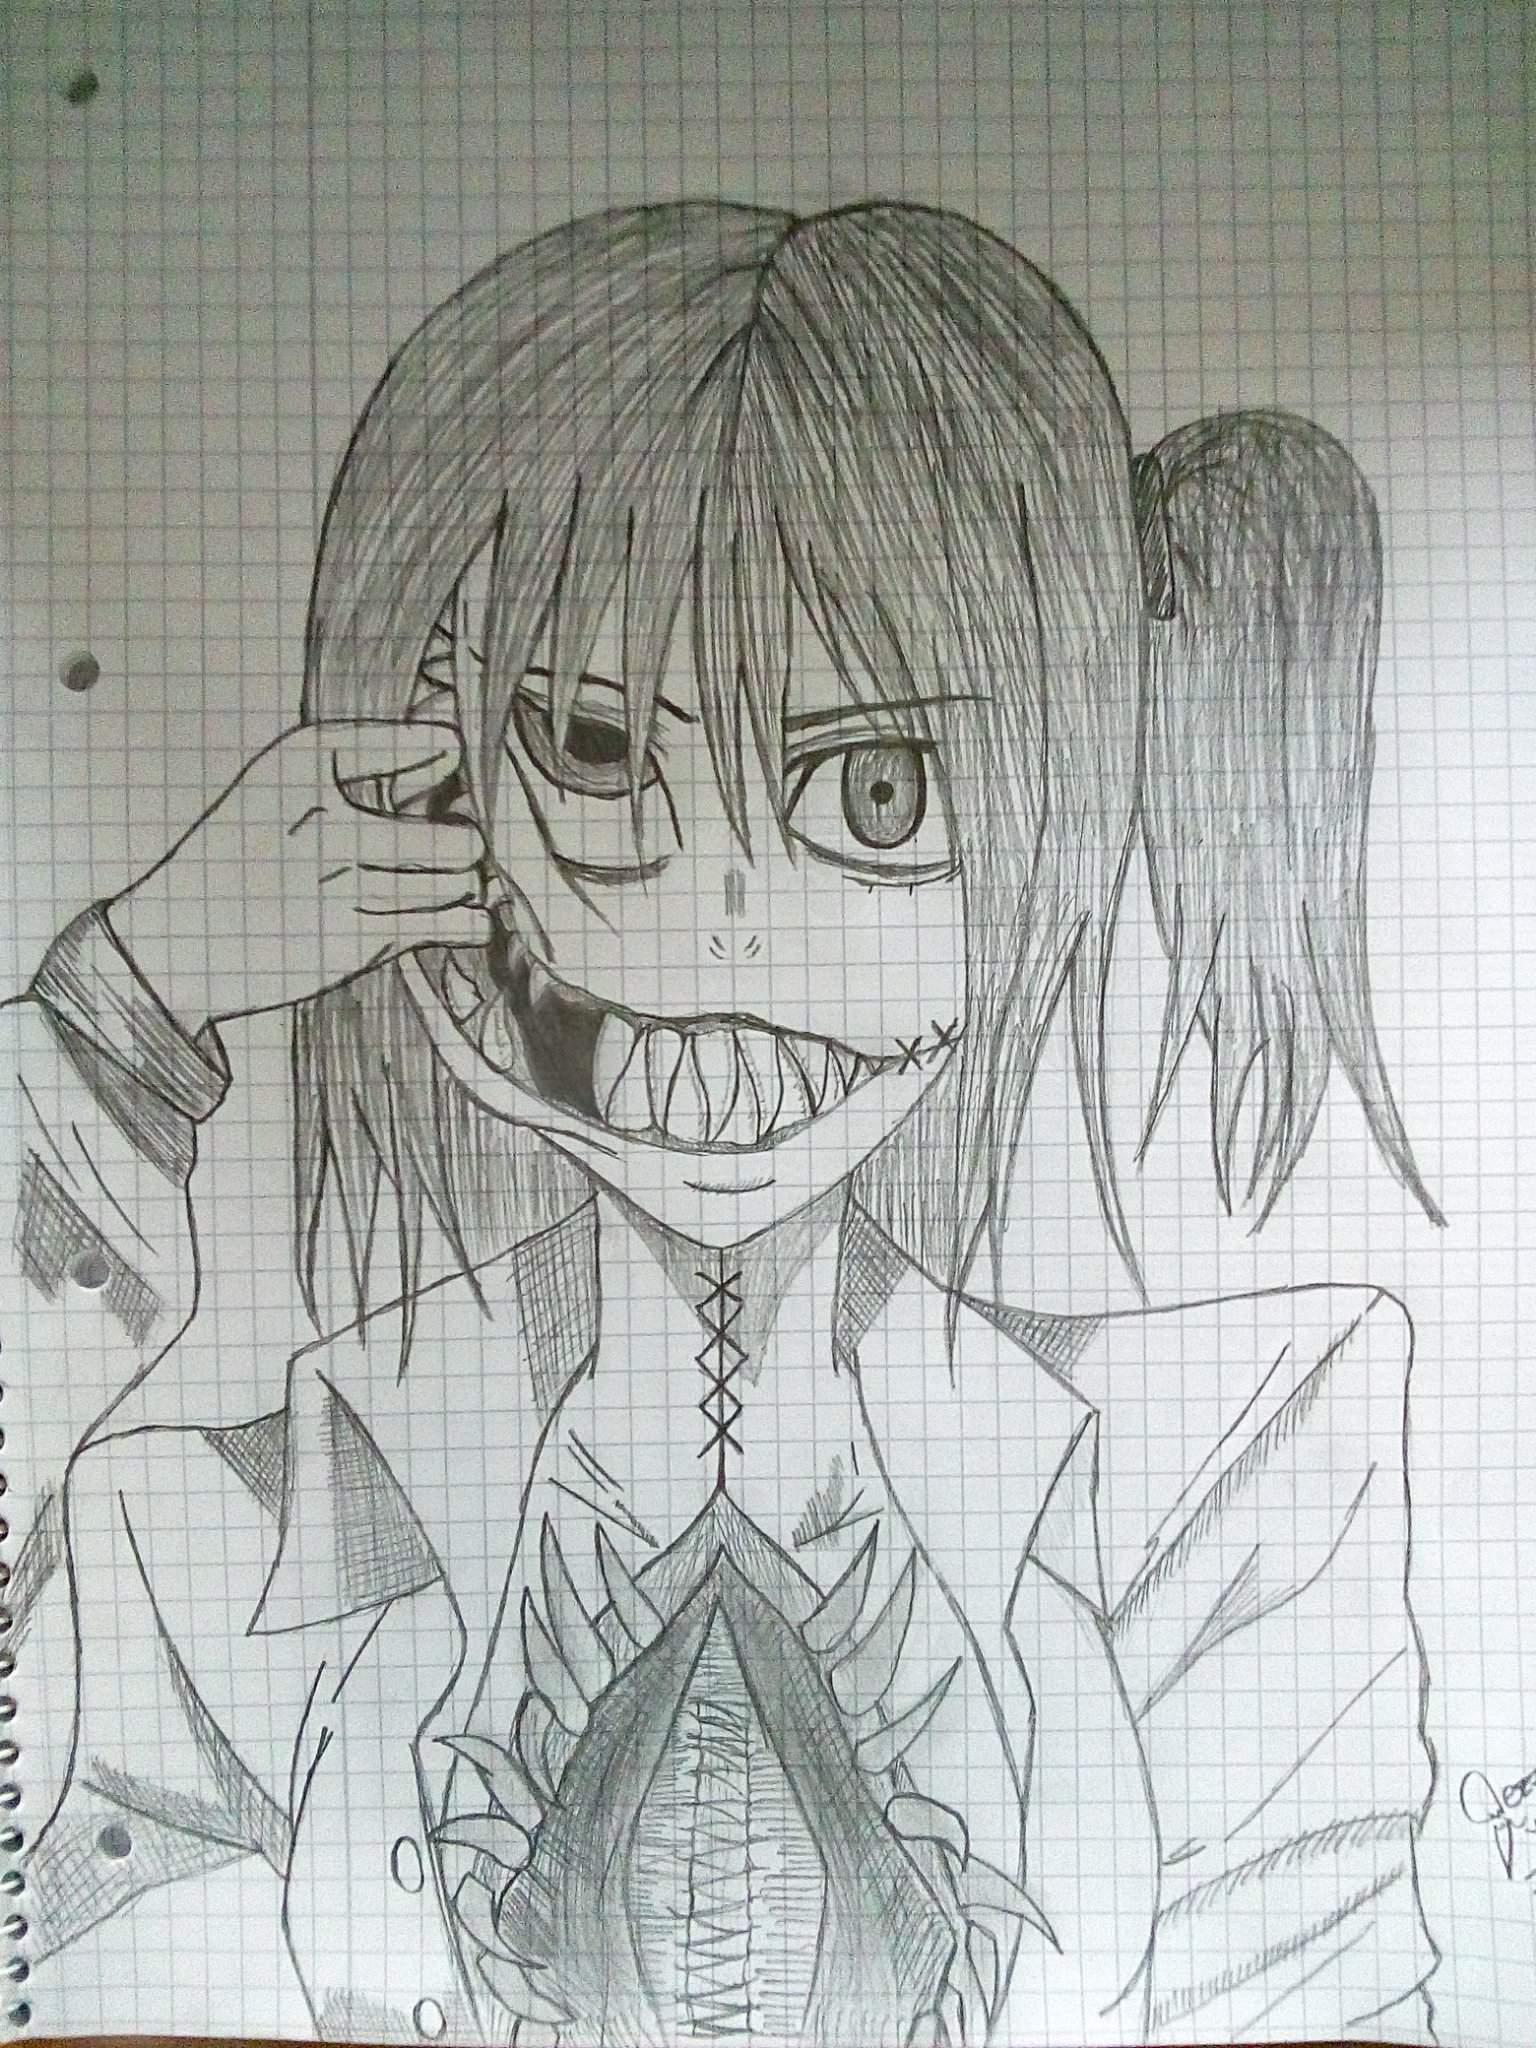 Another Horror Creepy Drawing Anime Amino